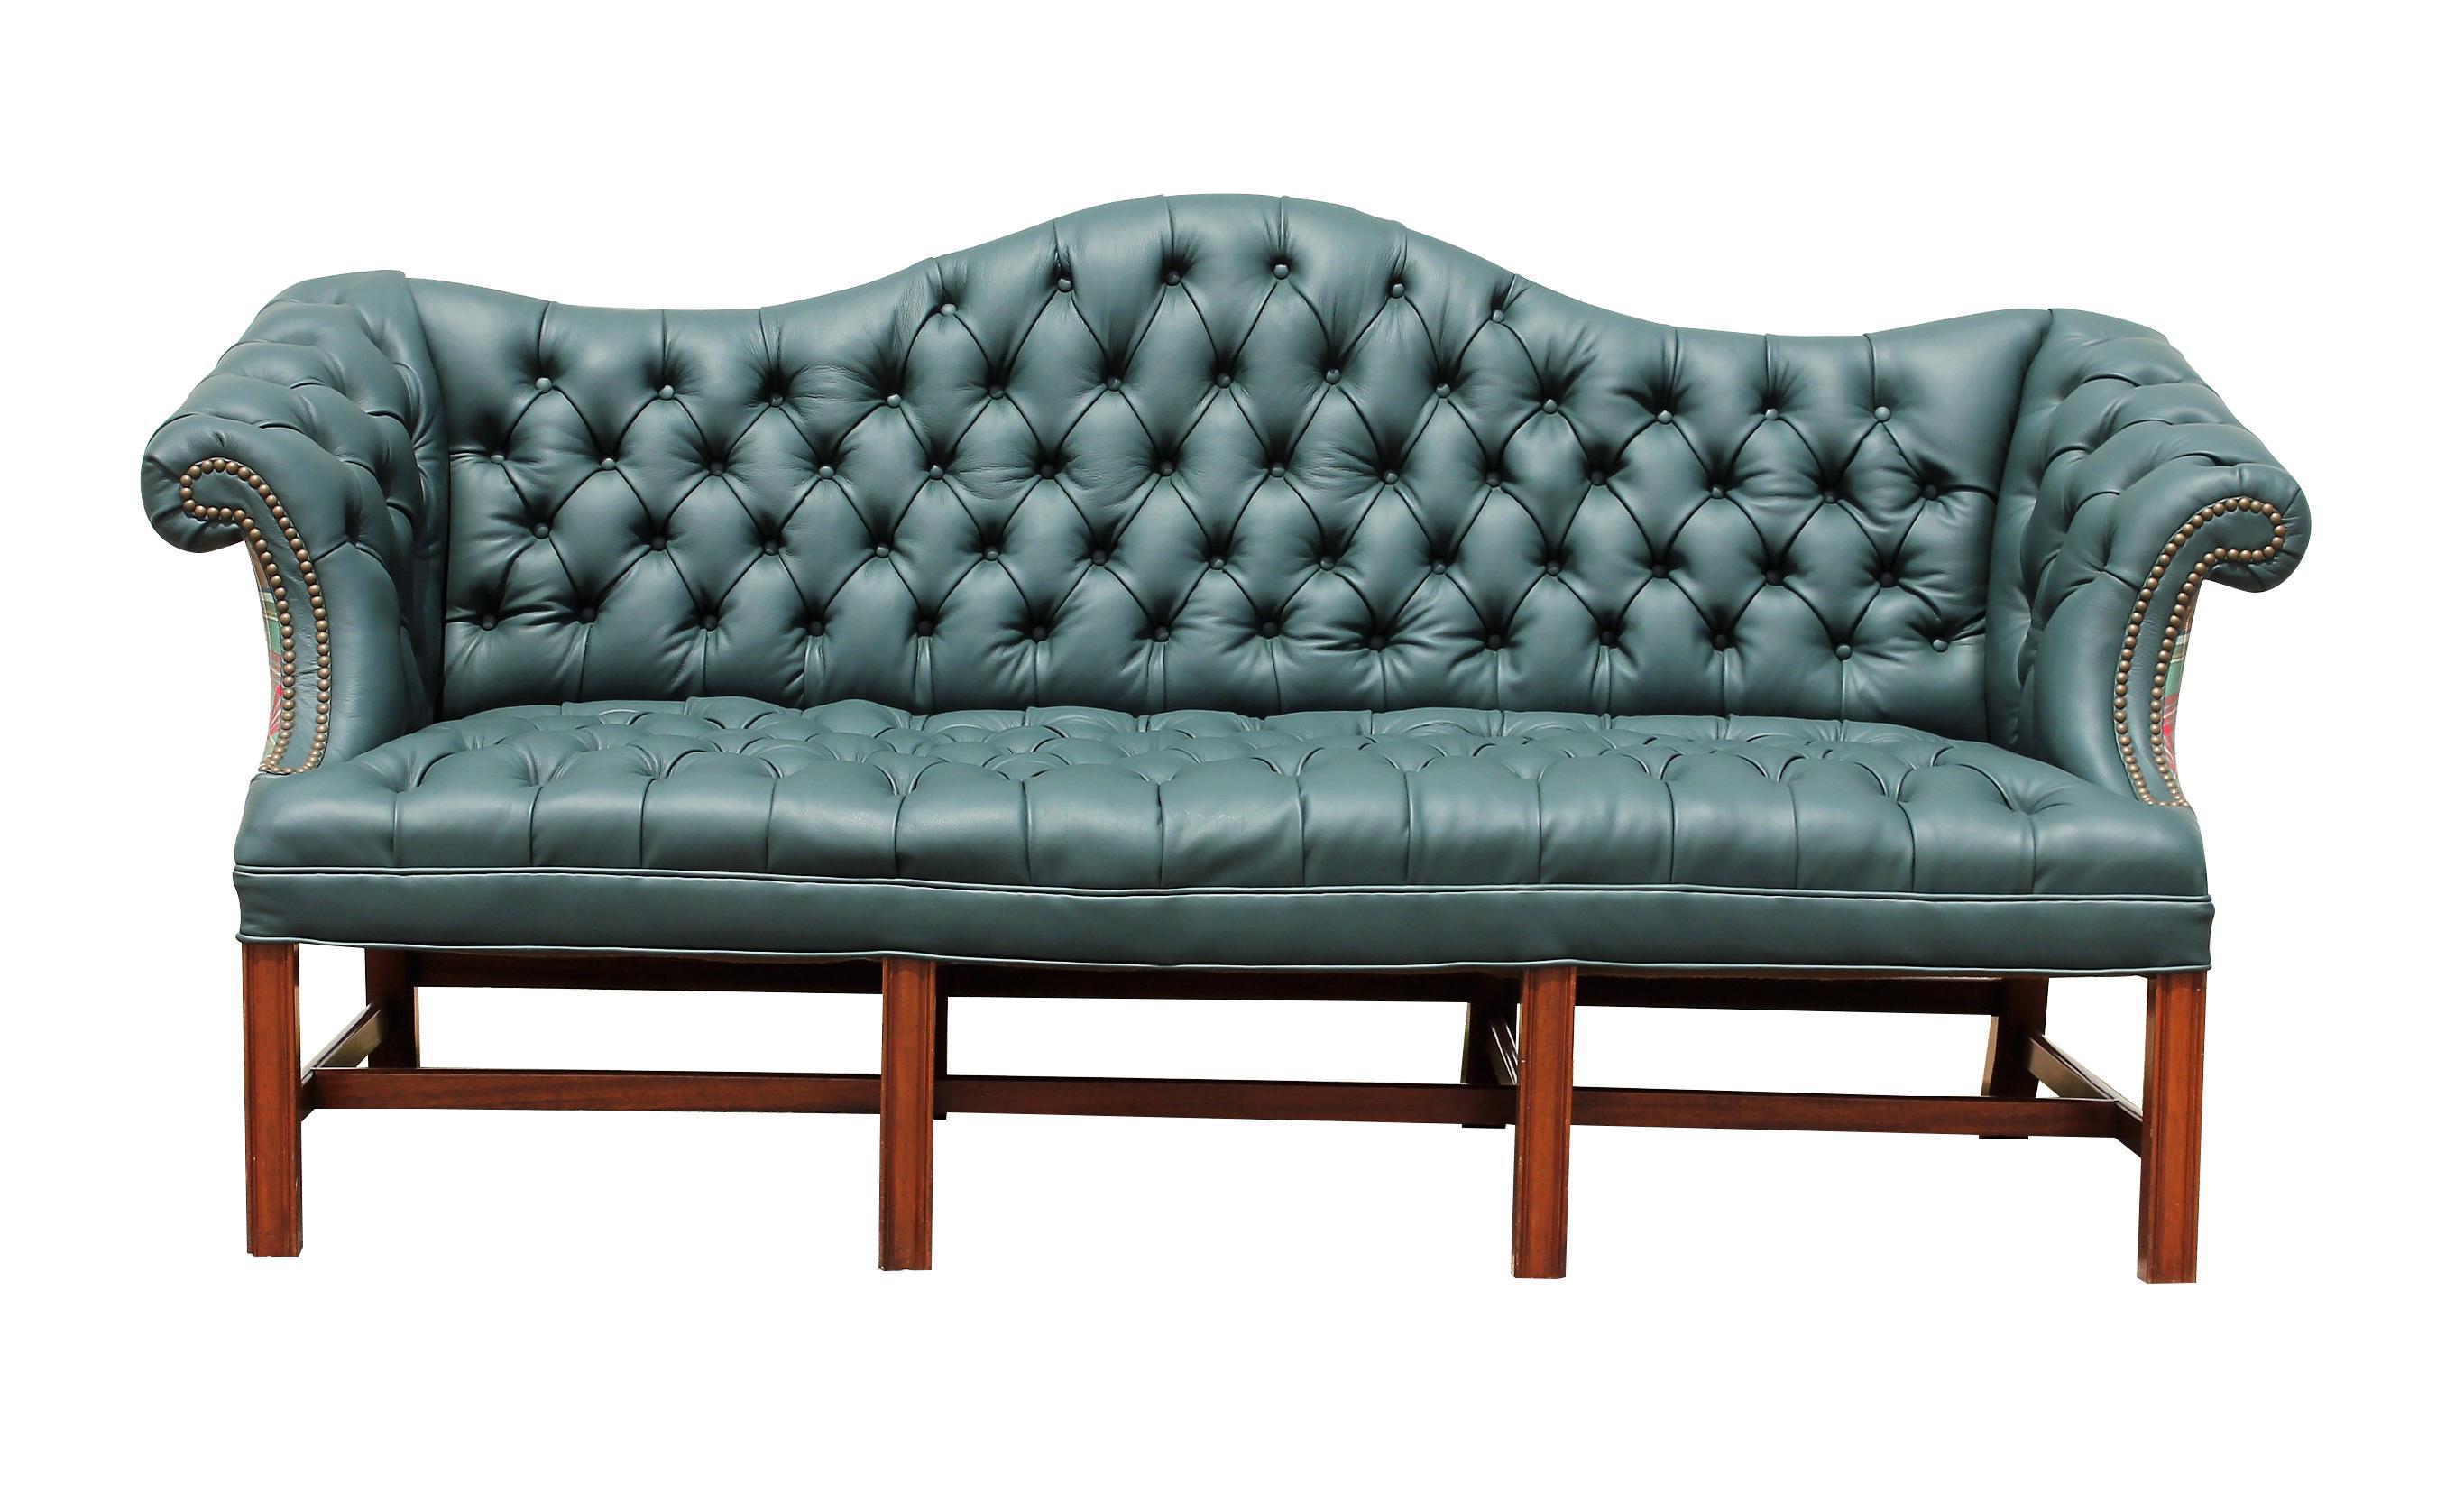 Genuine Italian Leather, Green Camelback Tufted Sofa For Sale